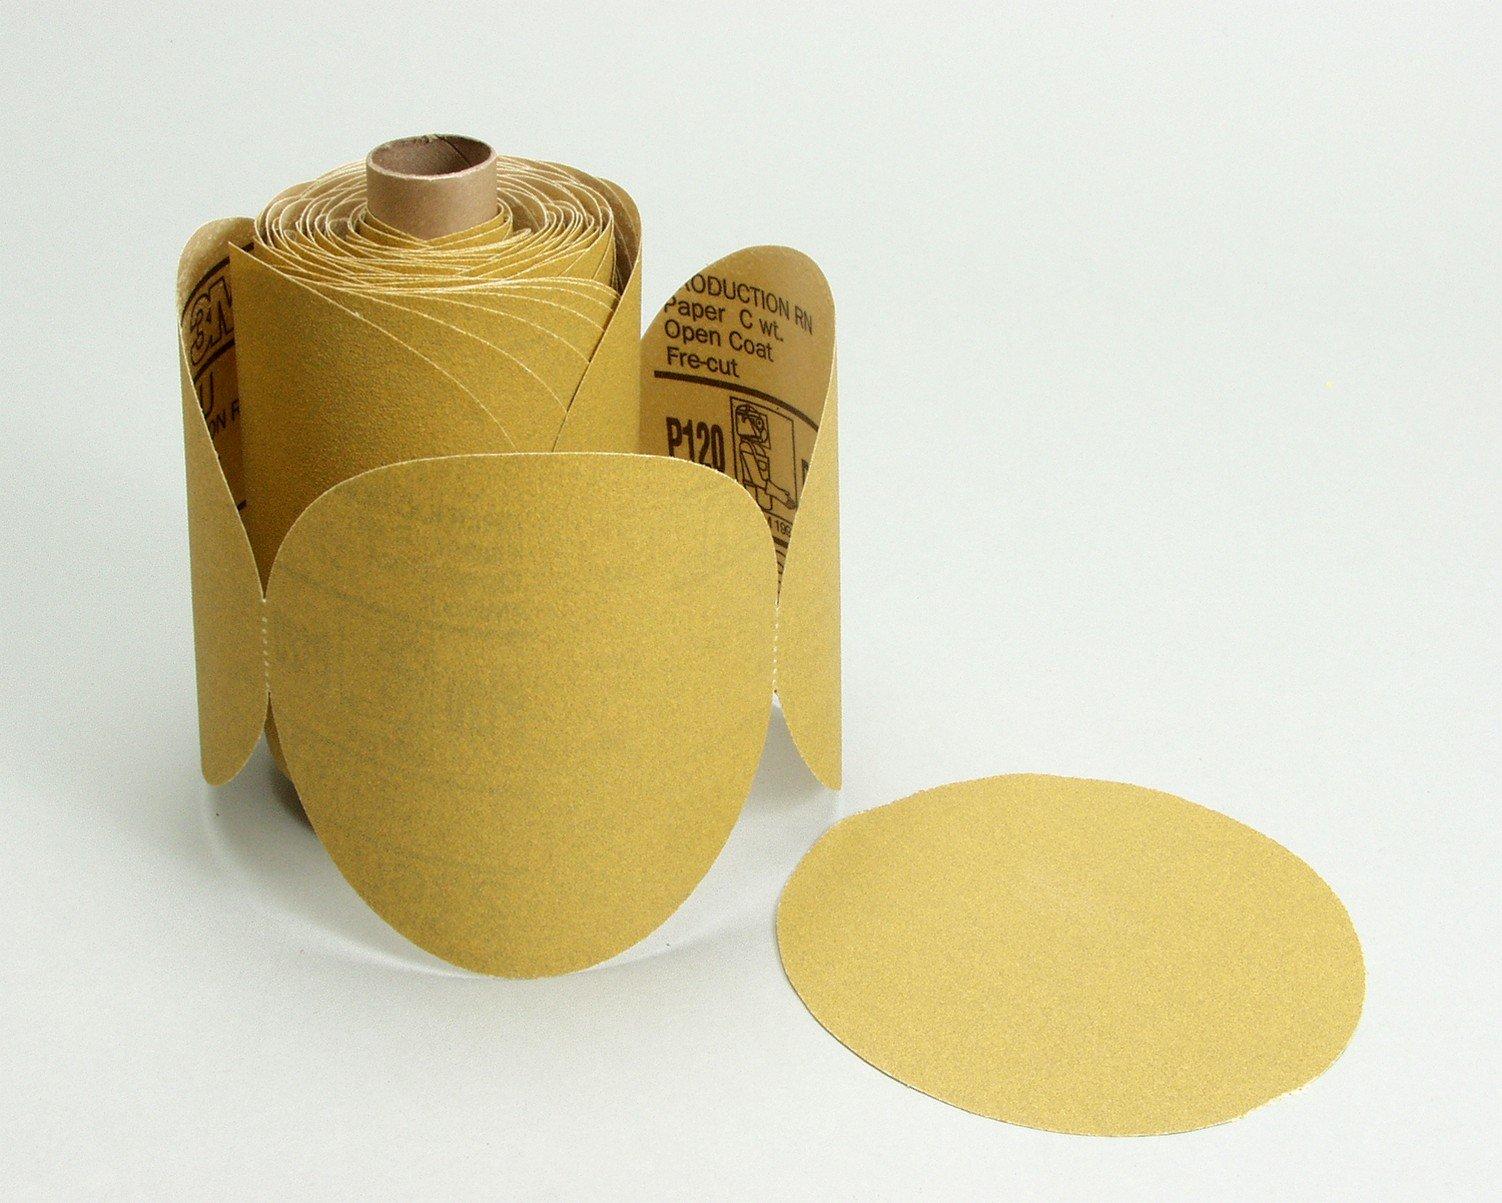 3M(TM) Stikit(TM) Paper Disc Roll 236U, C-weight, Pressure-Sensitive Adhesive (PSA) Attachment, Aluminum Oxide, 6'' Diameter, P80 Grit, Gold  (Pack of 1)